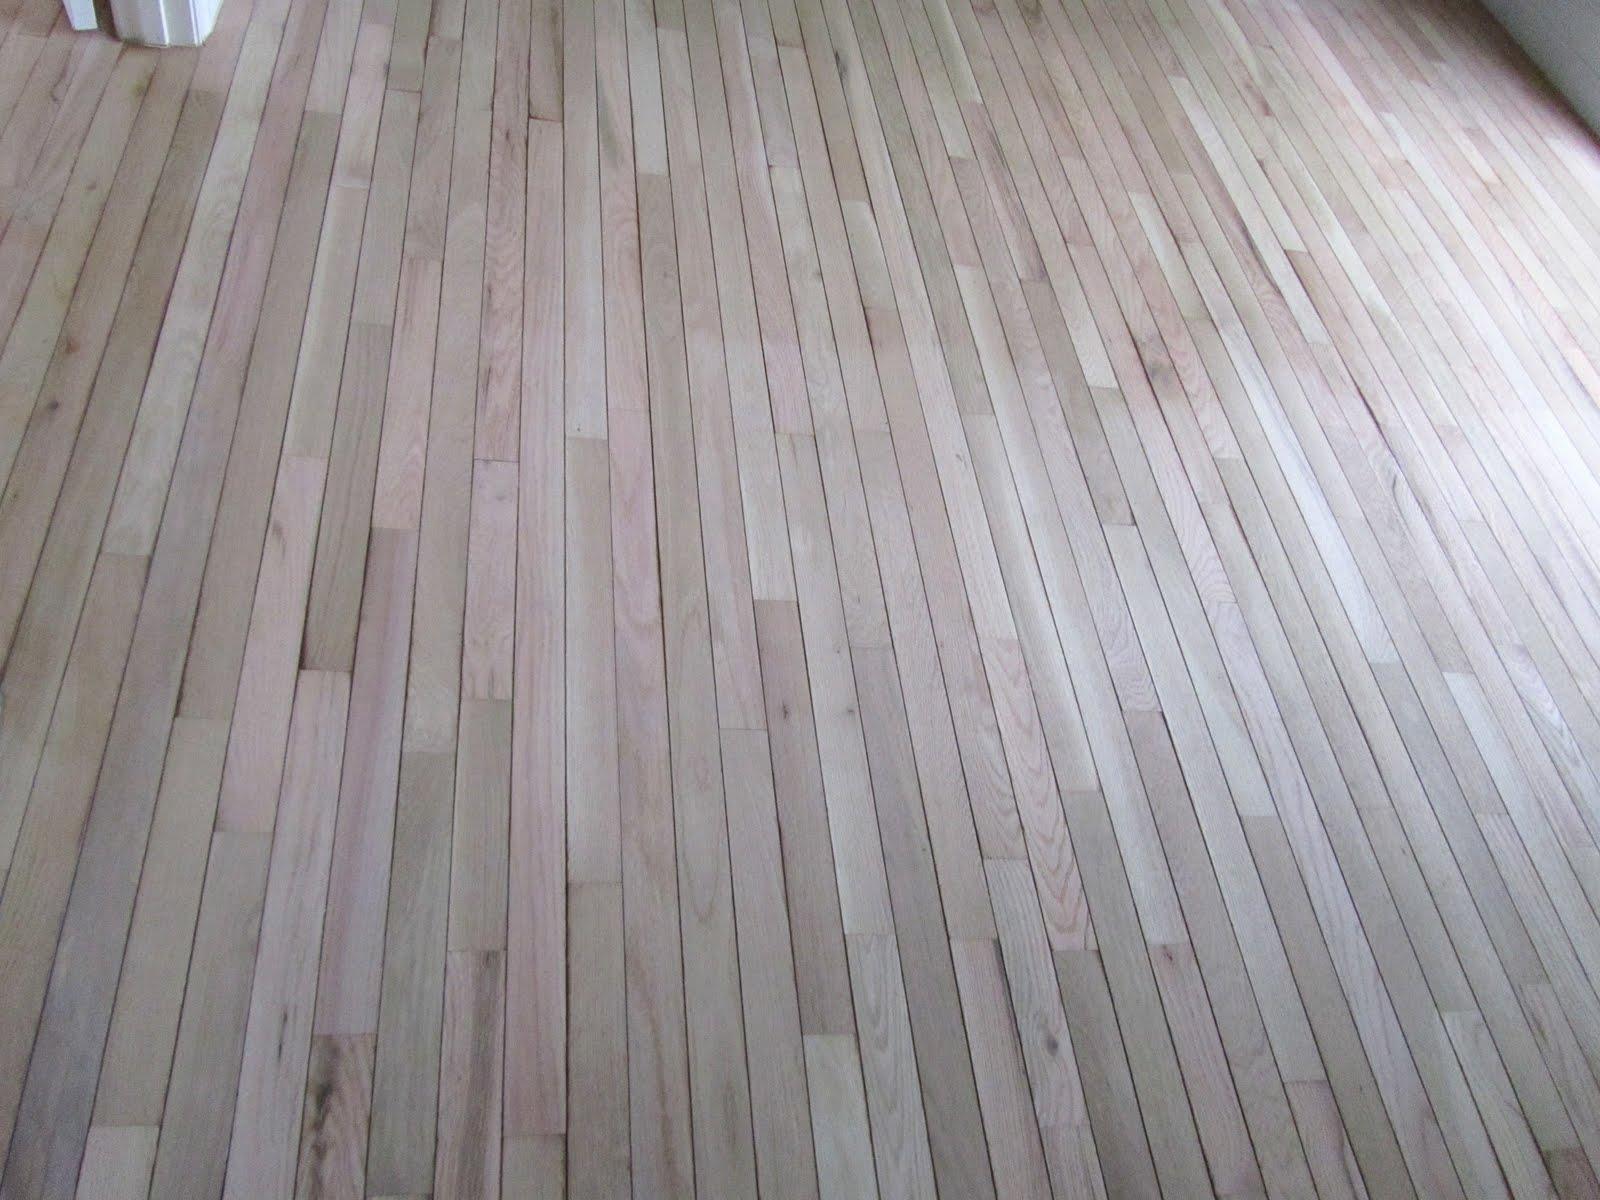 Acanthus And Acorn The Process Of Refinishing Hardwood